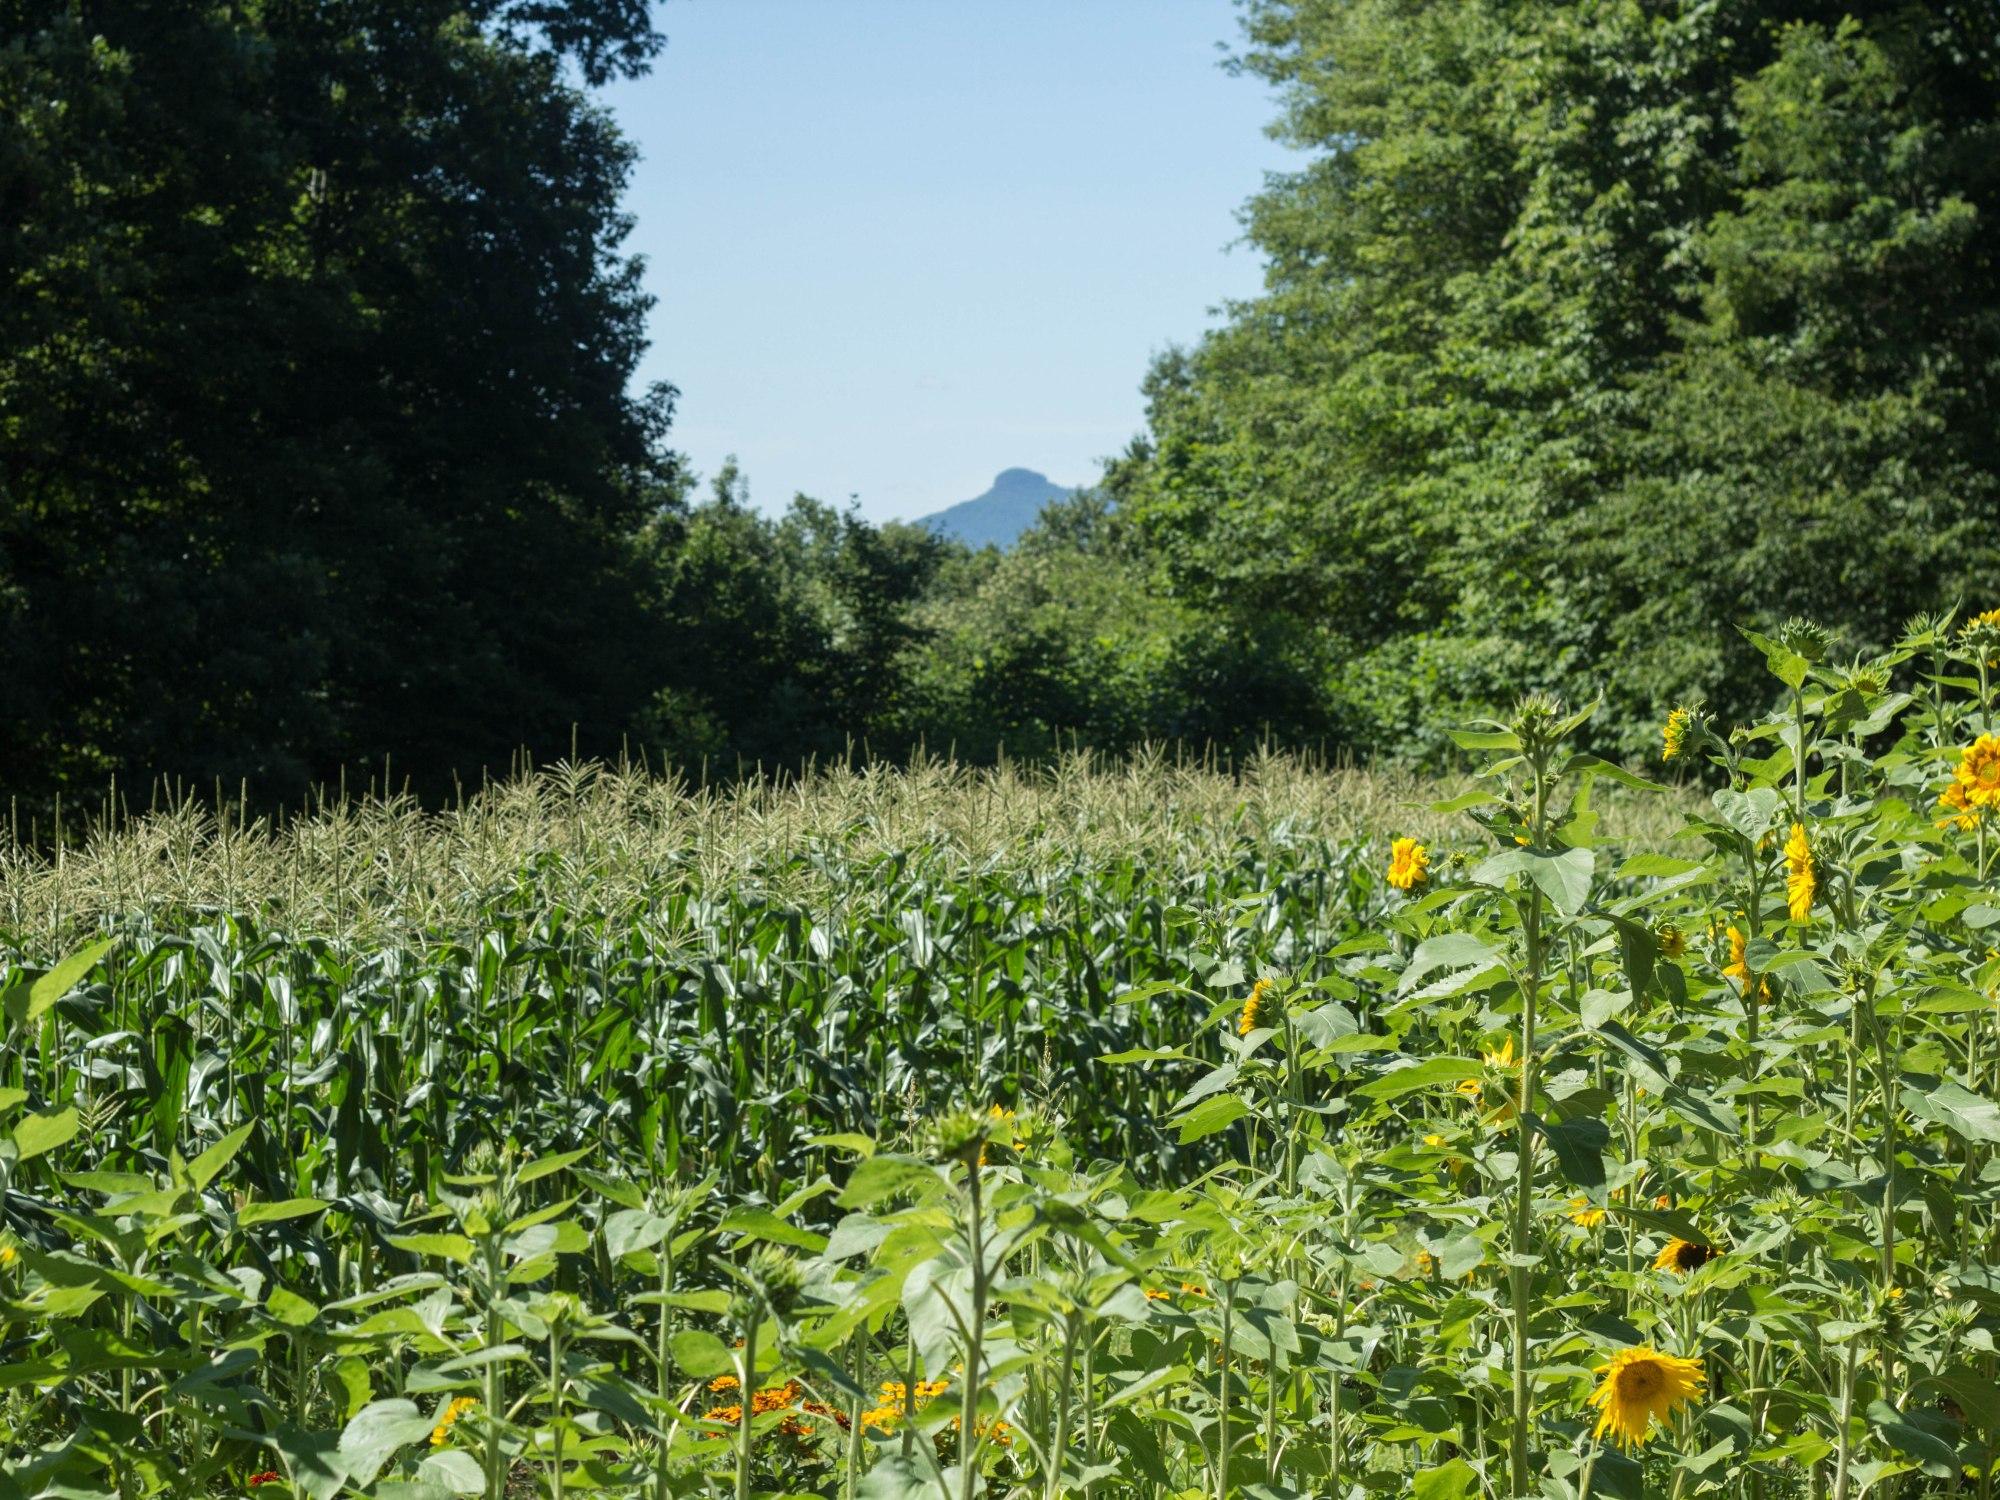 Minglewood Farm and Preserve, TowniesWS.com